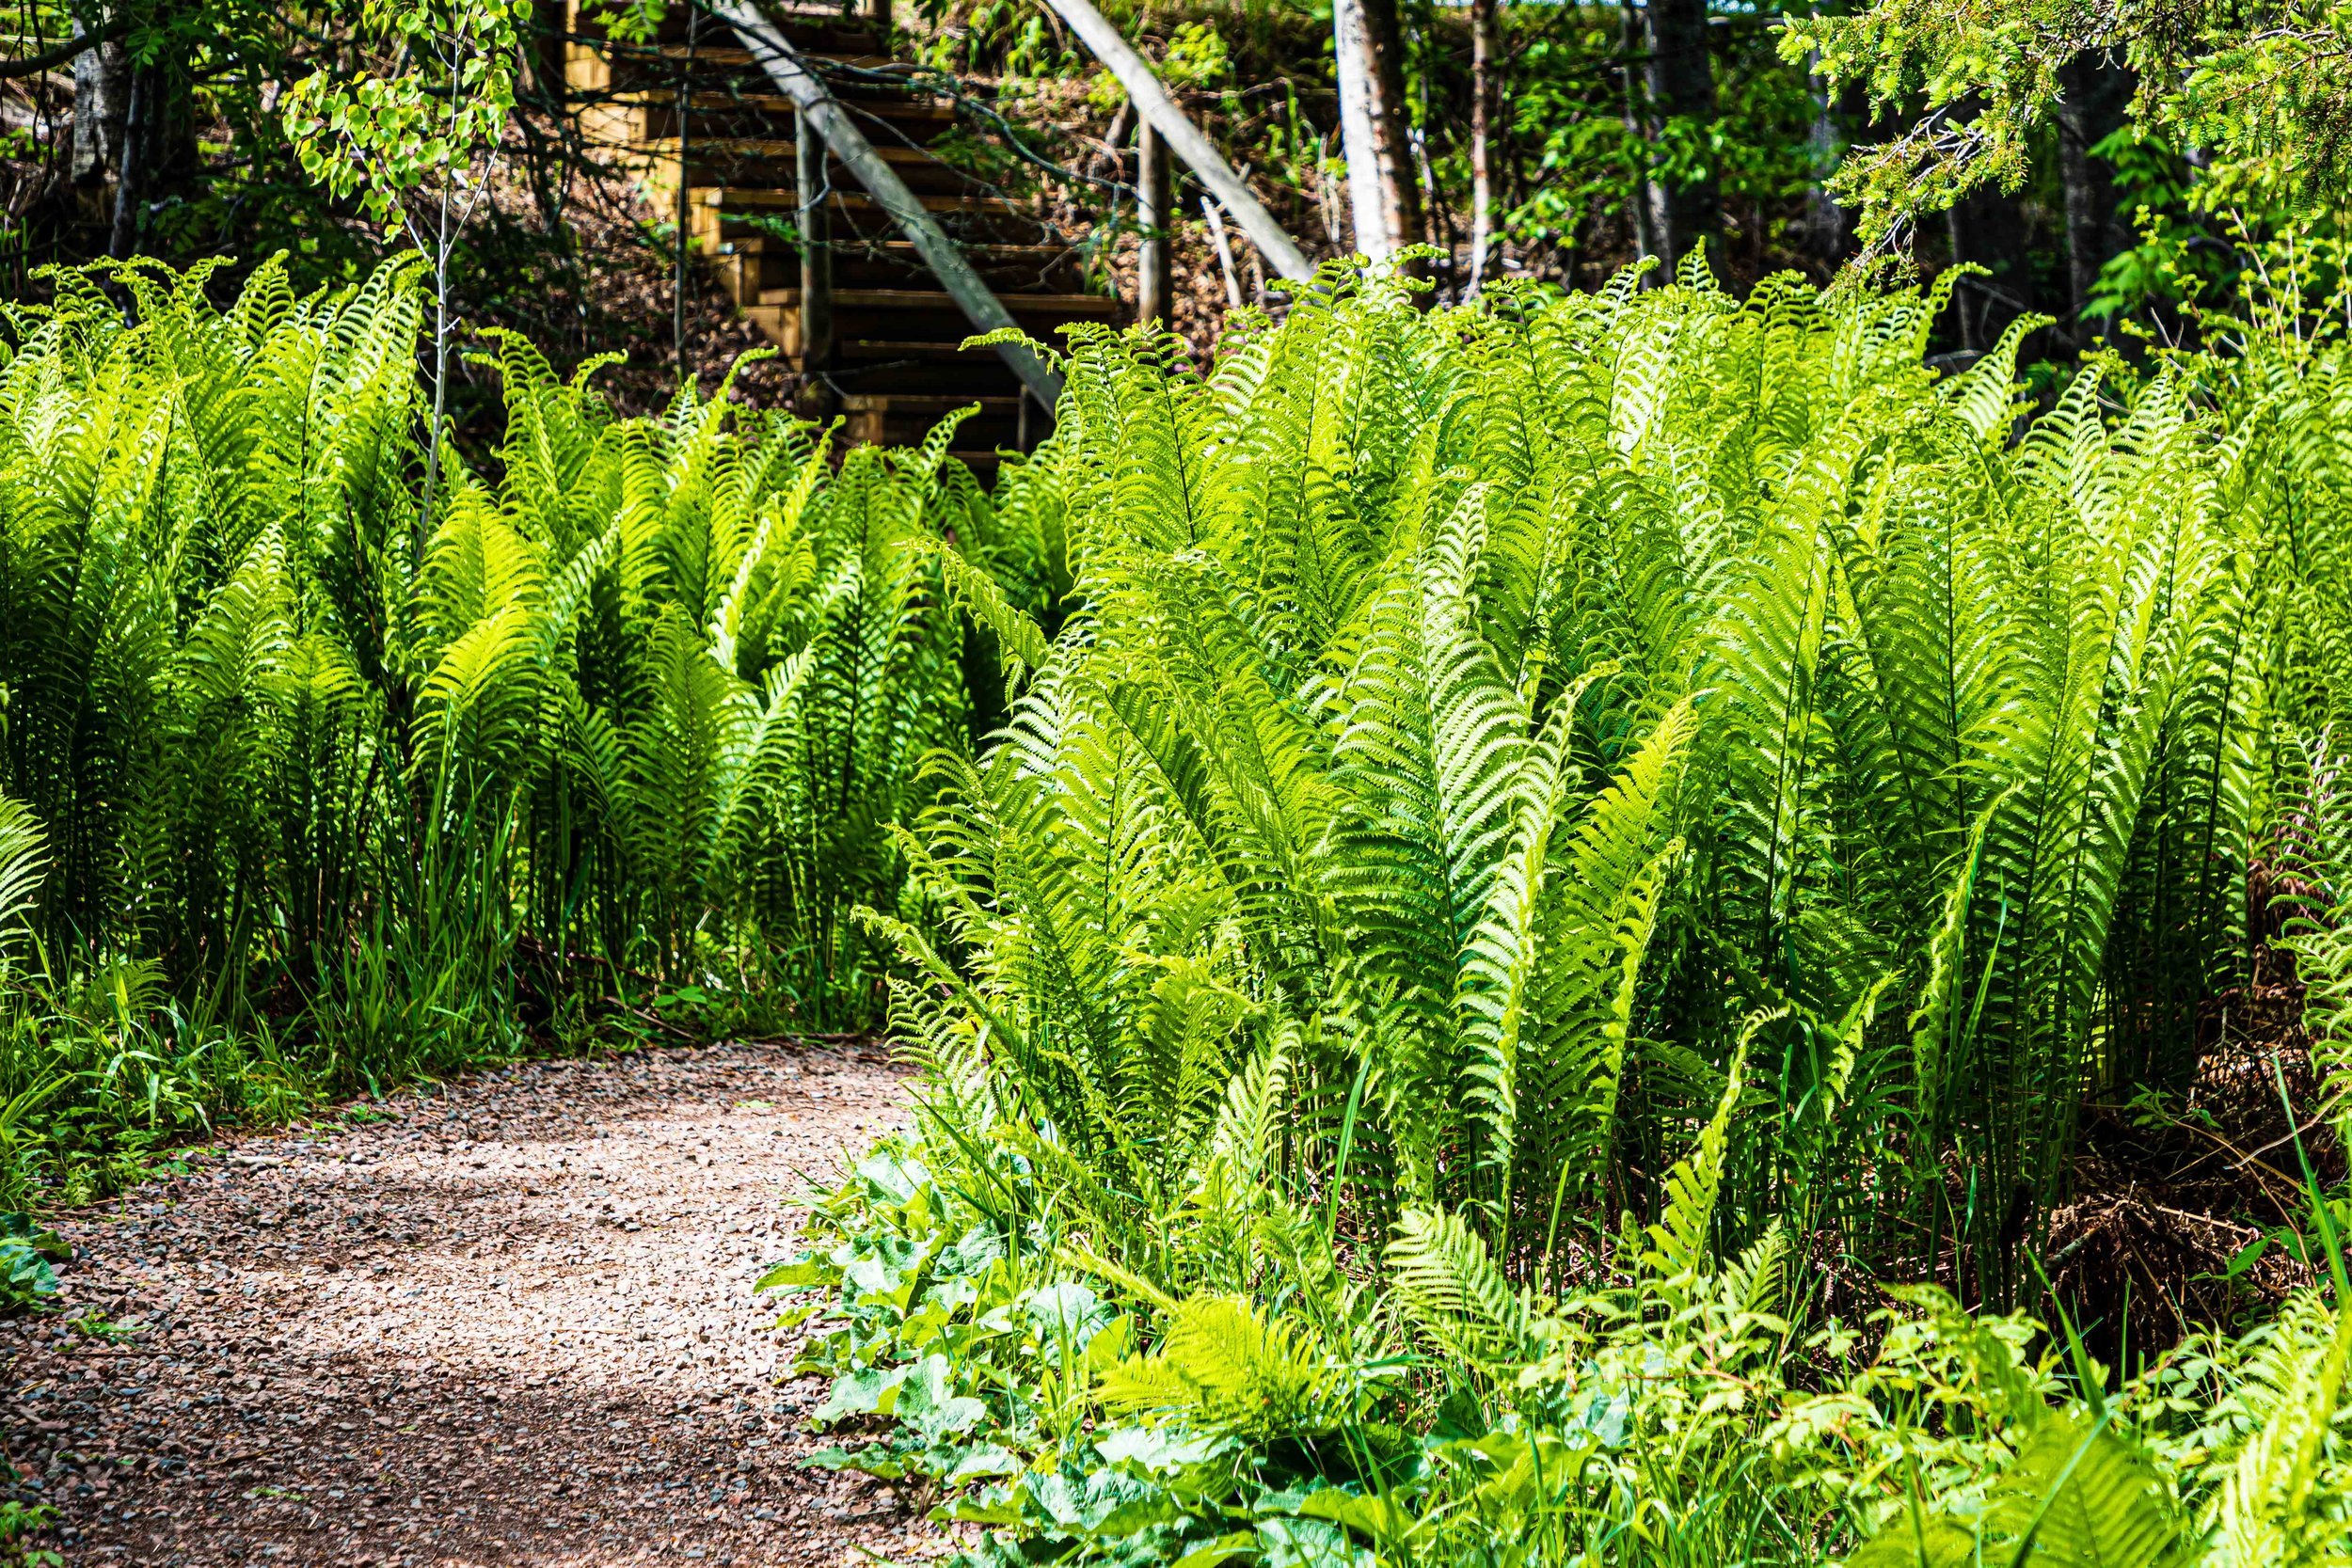 Minnesota North Shore Forest: Lush Ferns